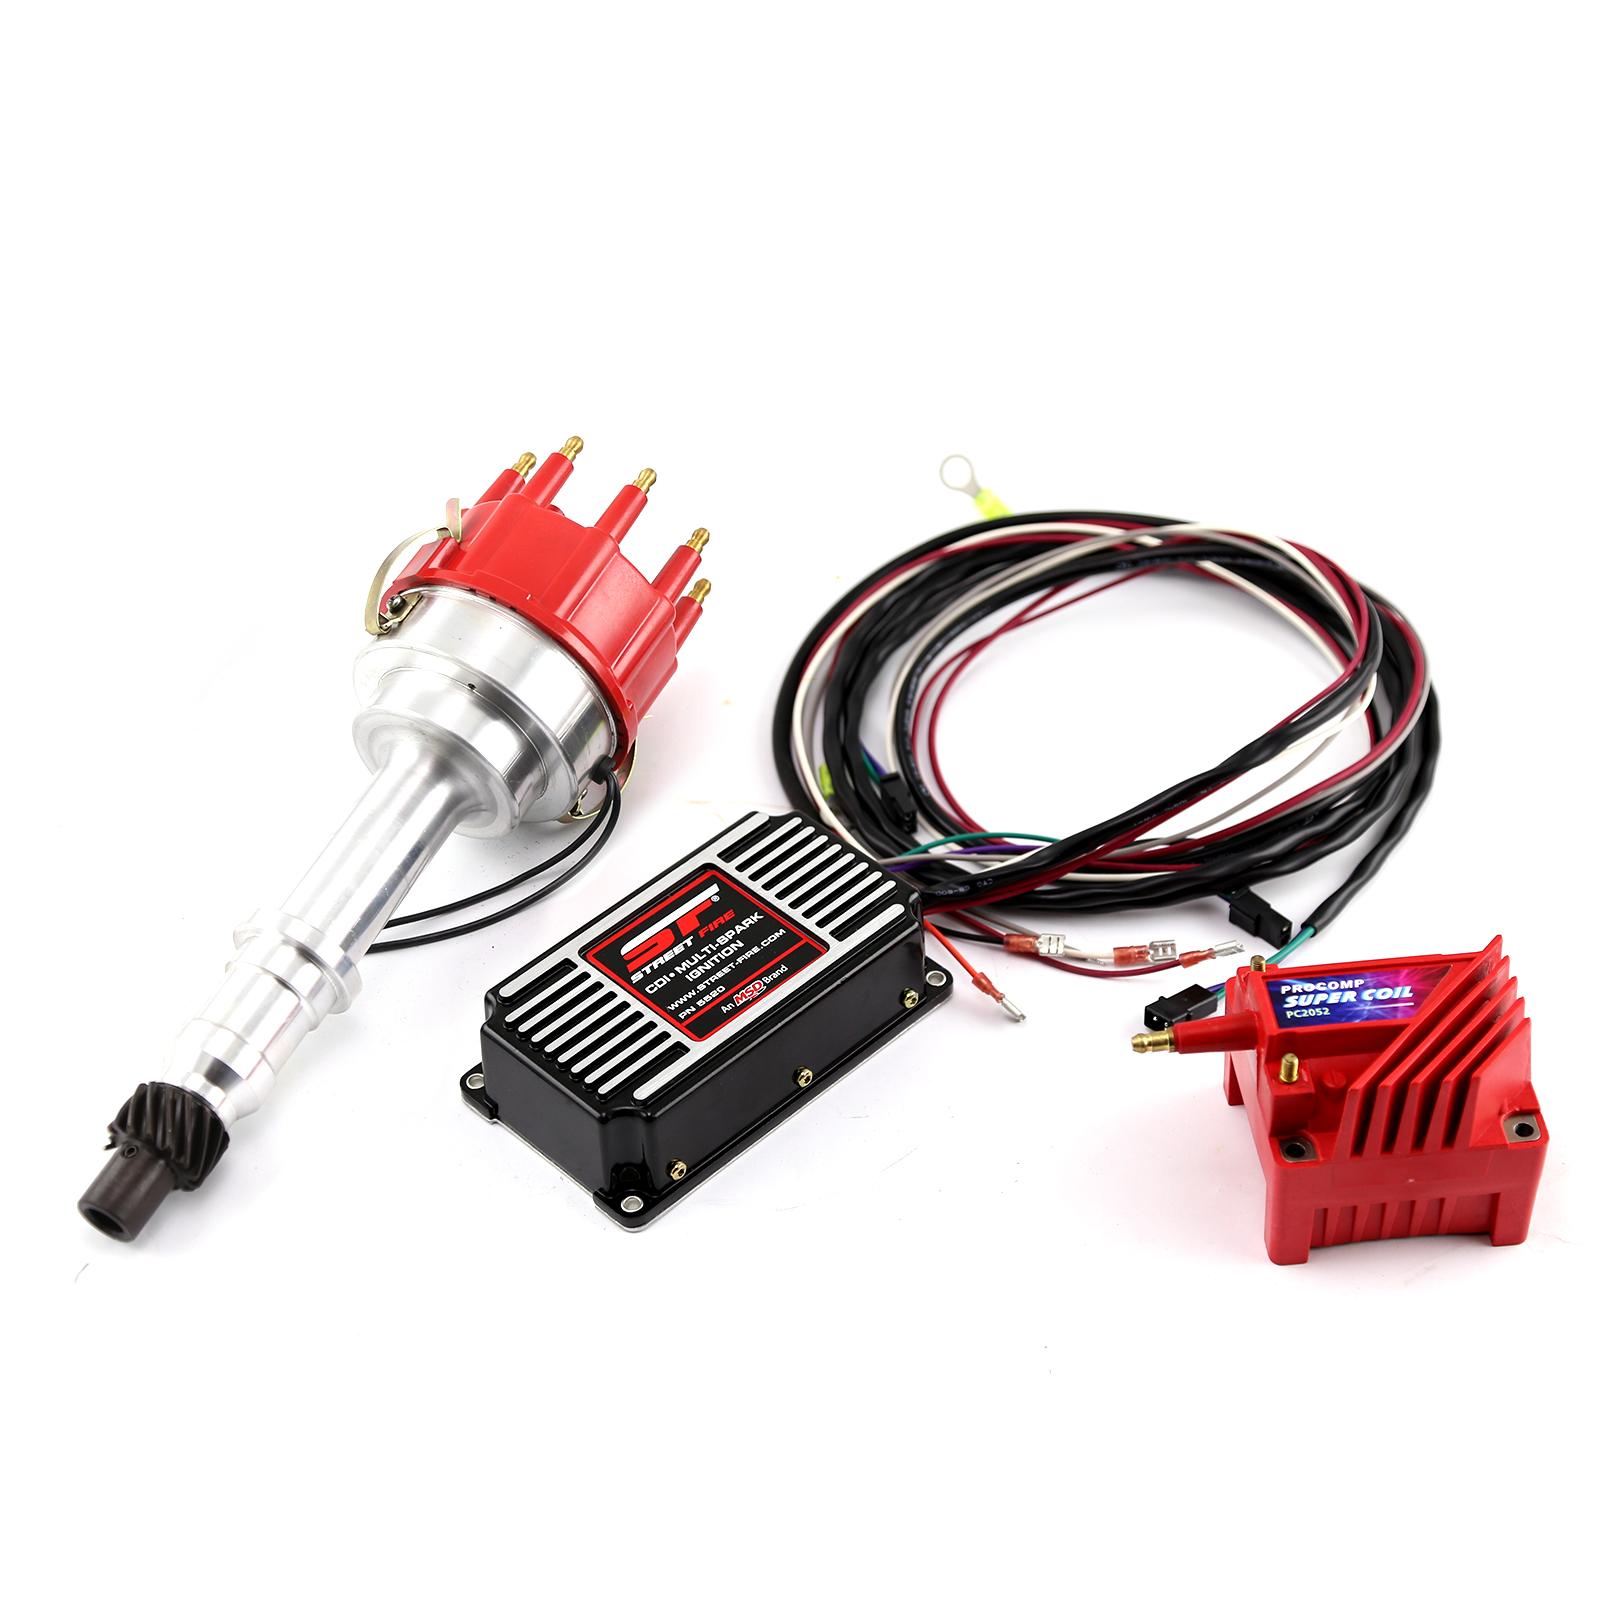 Pontiac 326 400 455 Pro Billet Distributor MSD CDI 5520 Ignition & Coil Kit